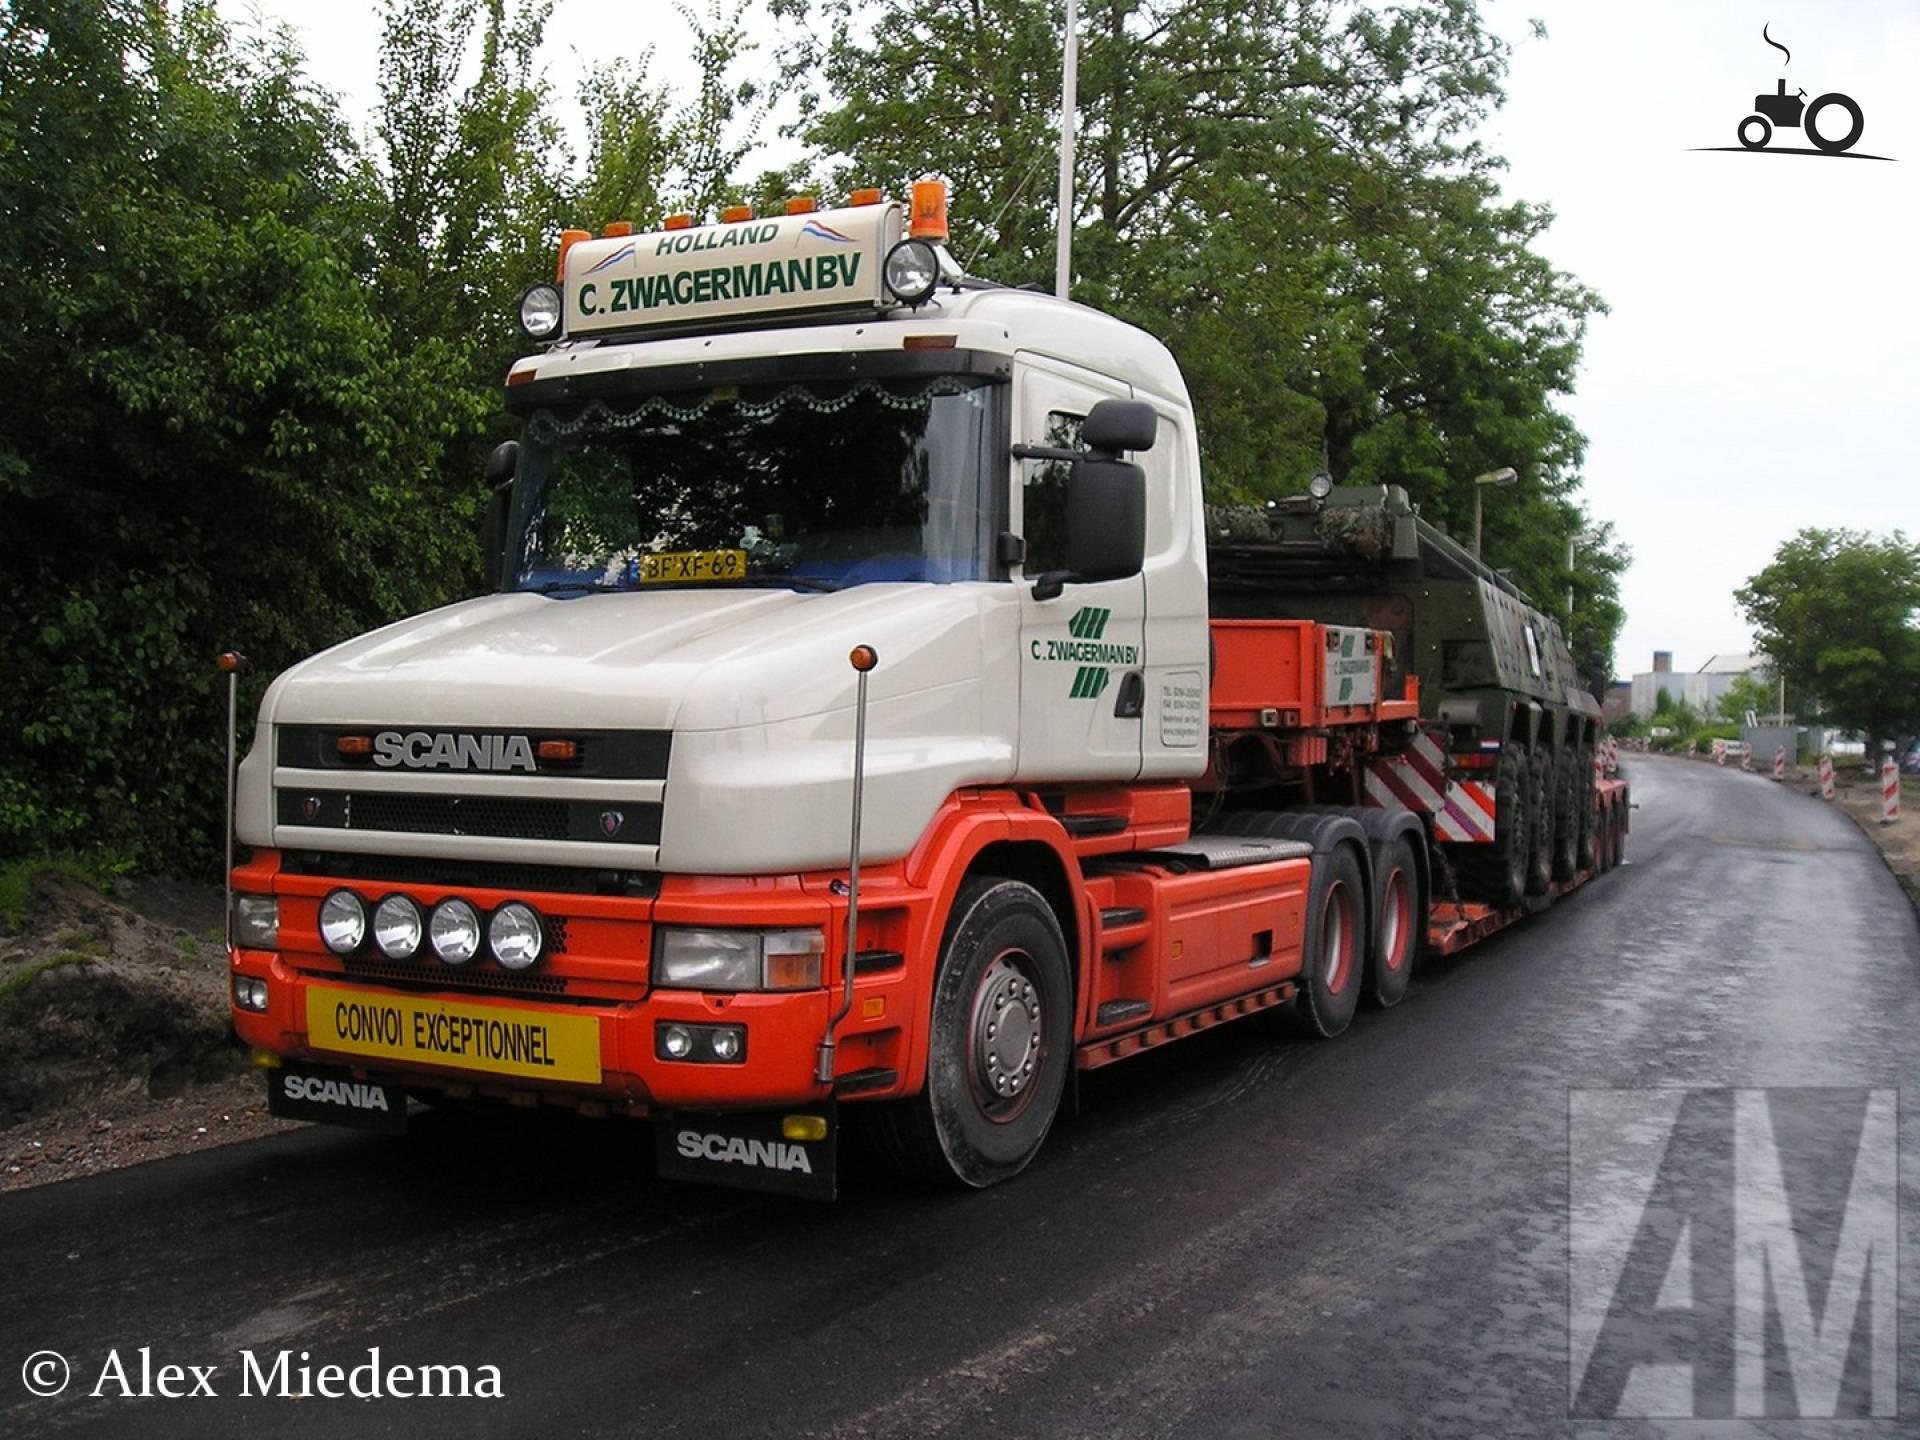 Scania T4